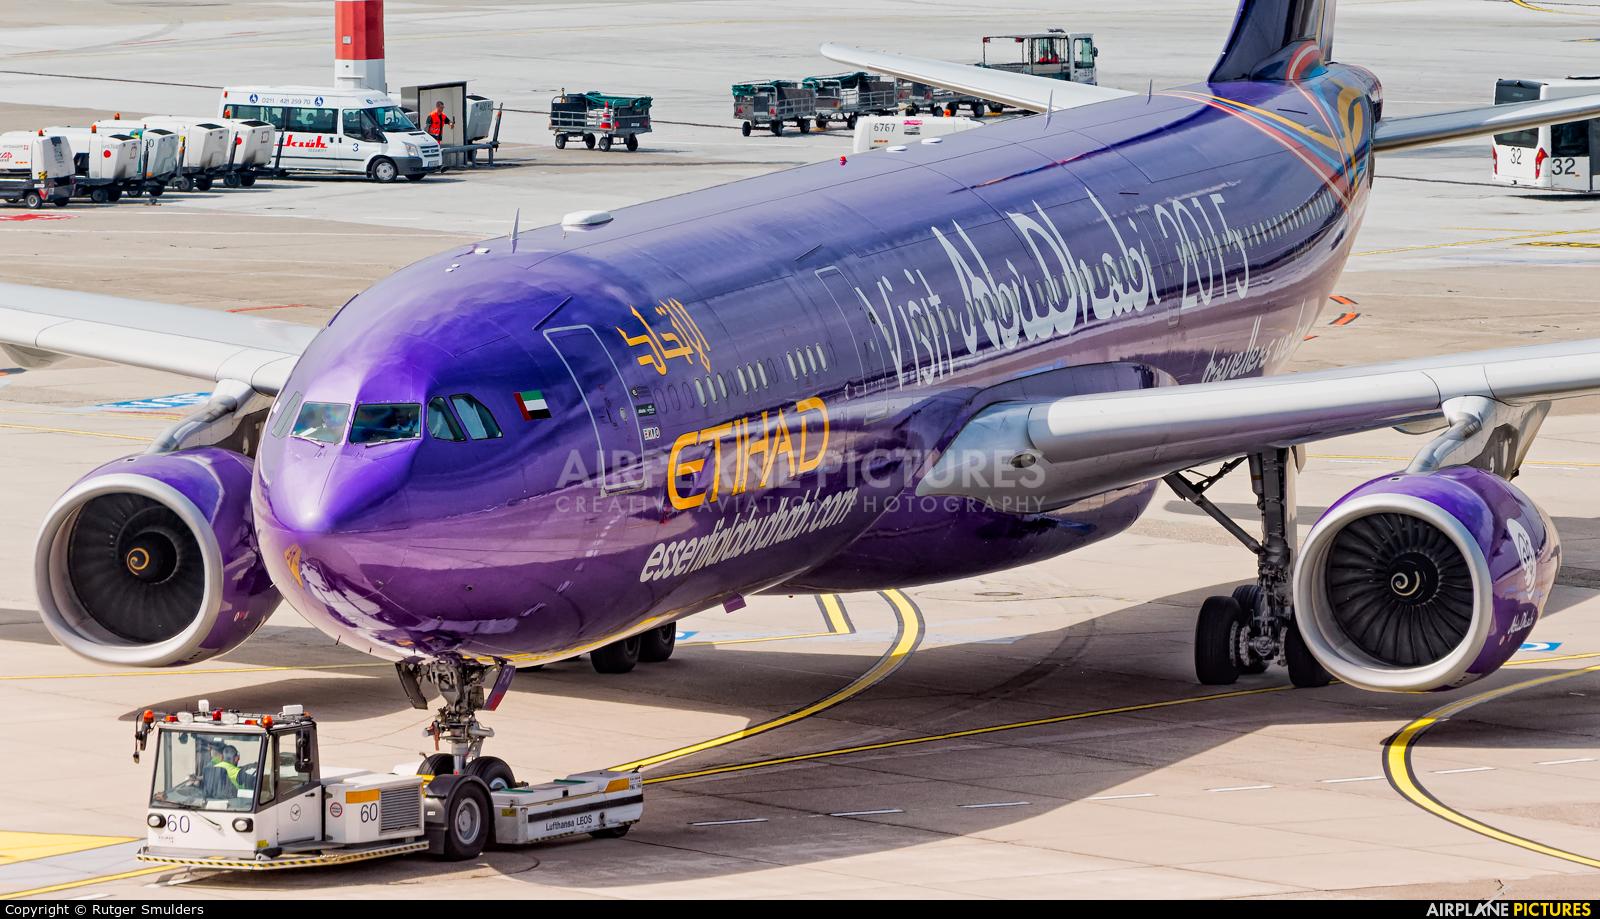 Etihad Airways A6-AFA aircraft at Düsseldorf